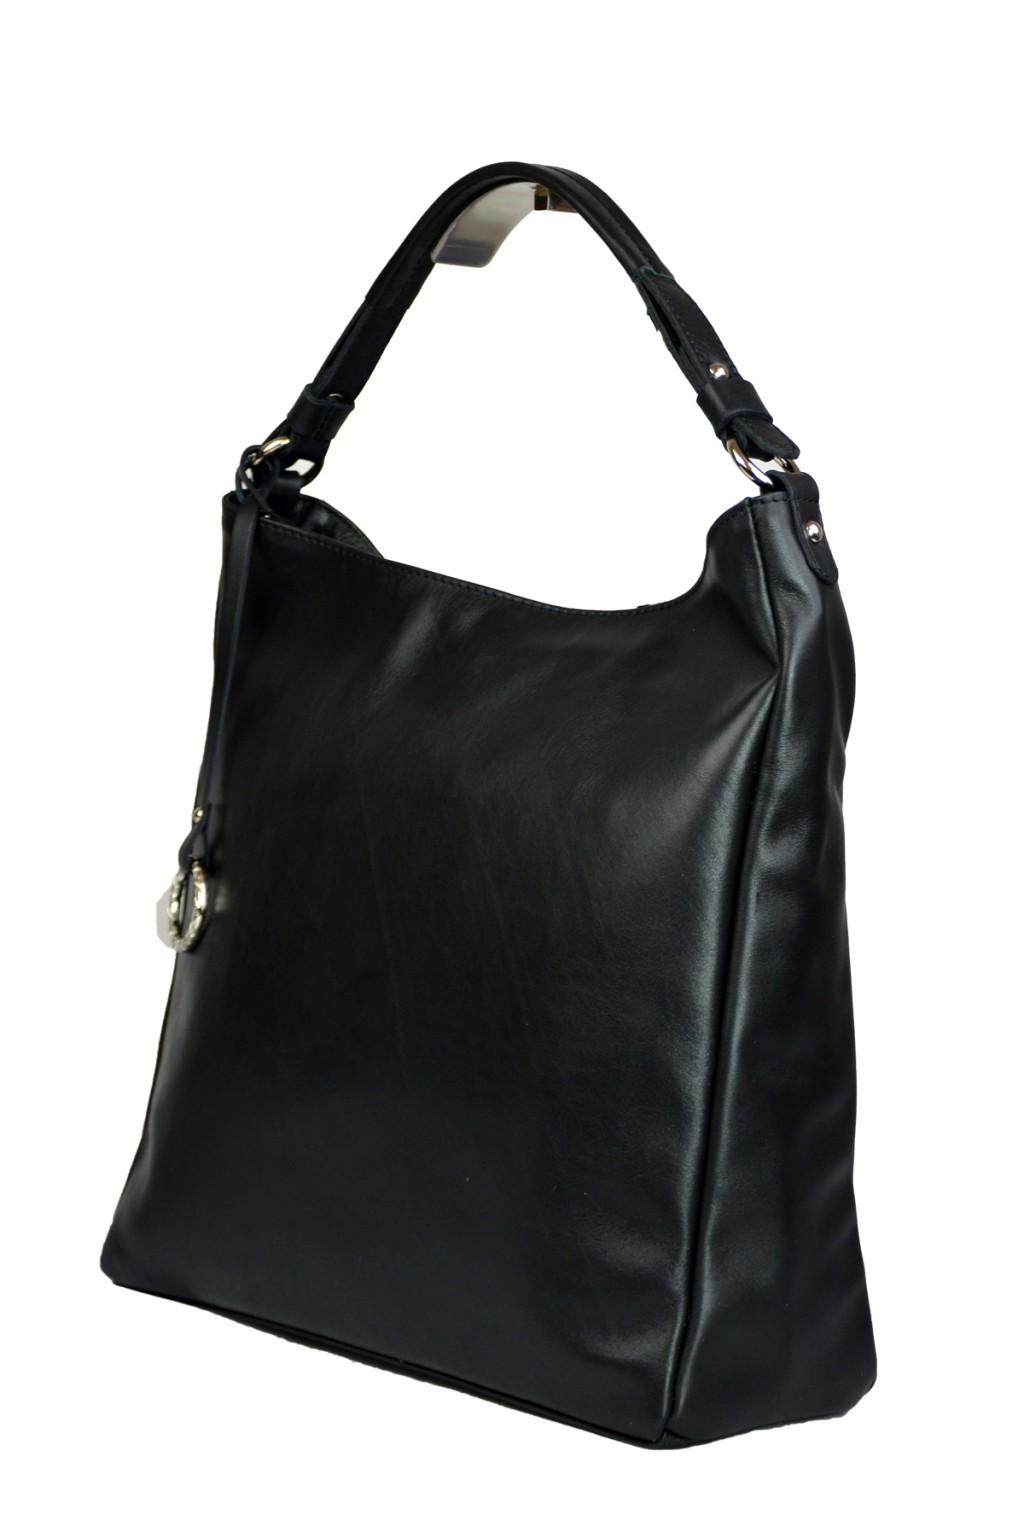 Dámská kožená kabelka FACEBAG  ELIA - Černá hladká